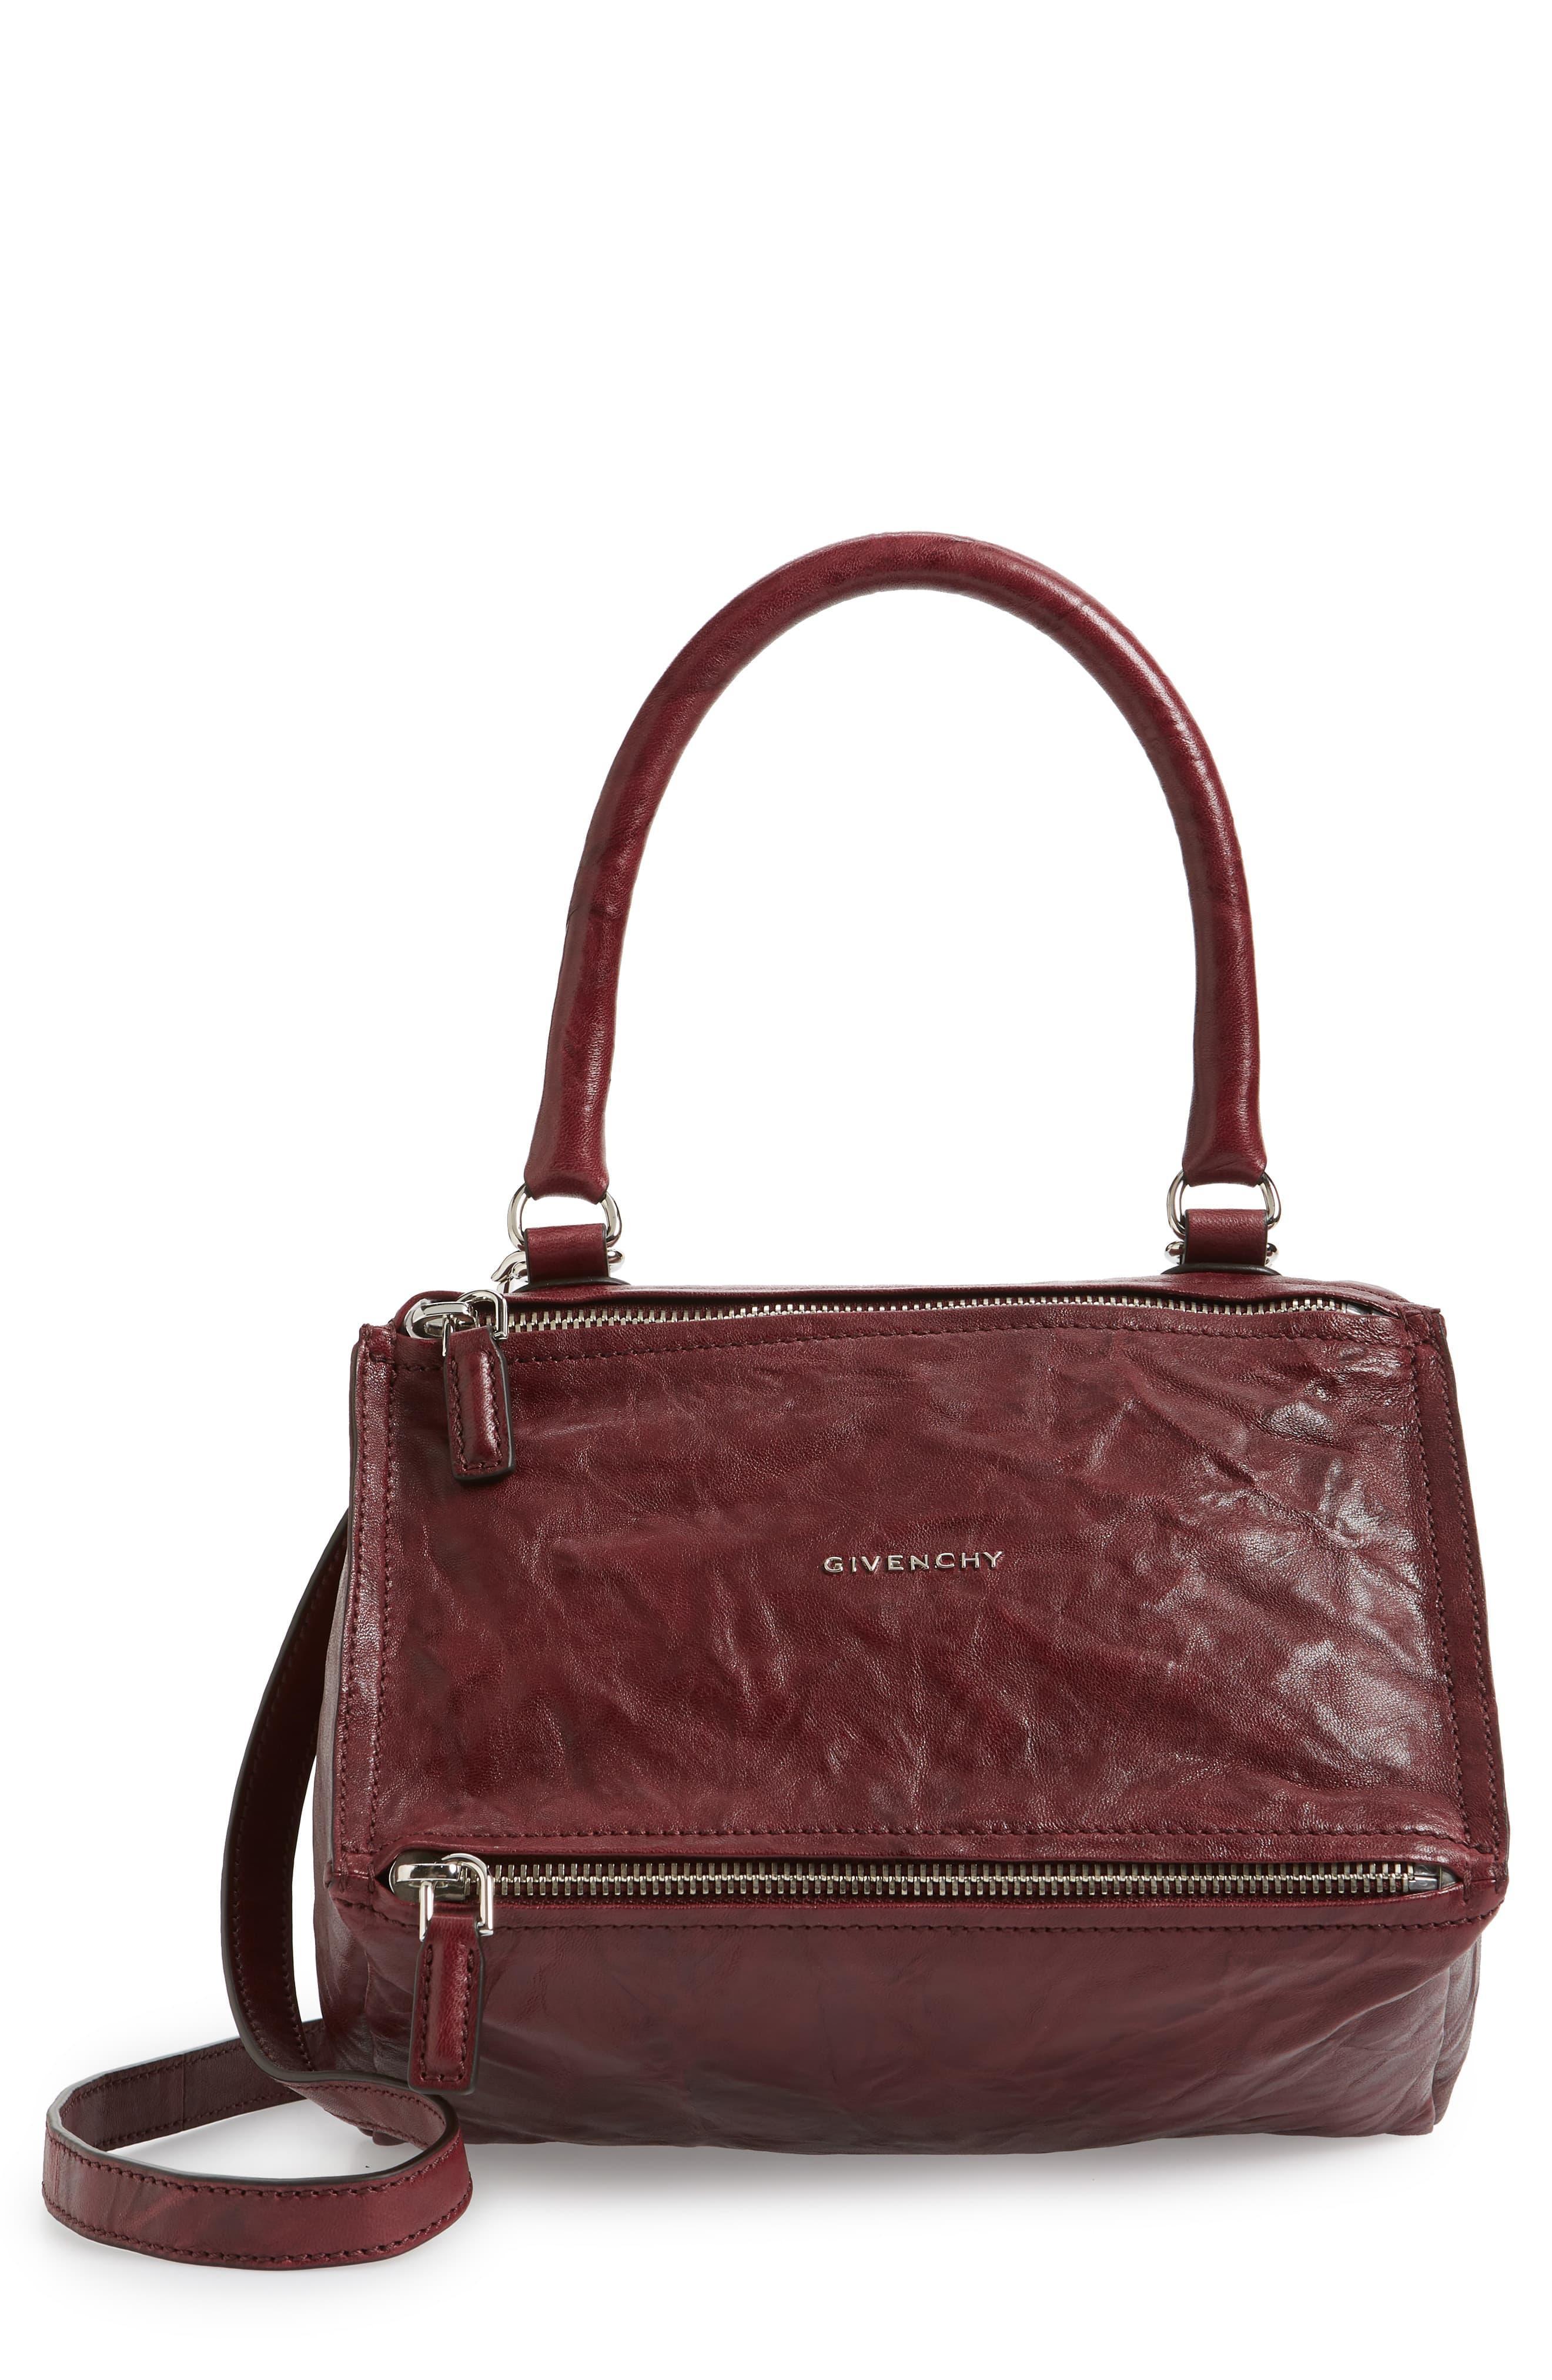 c32ce11f431 Givenchy - Brown 'small Pepe Pandora' Leather Crossbody Bag - Burgundy -  Lyst. View fullscreen